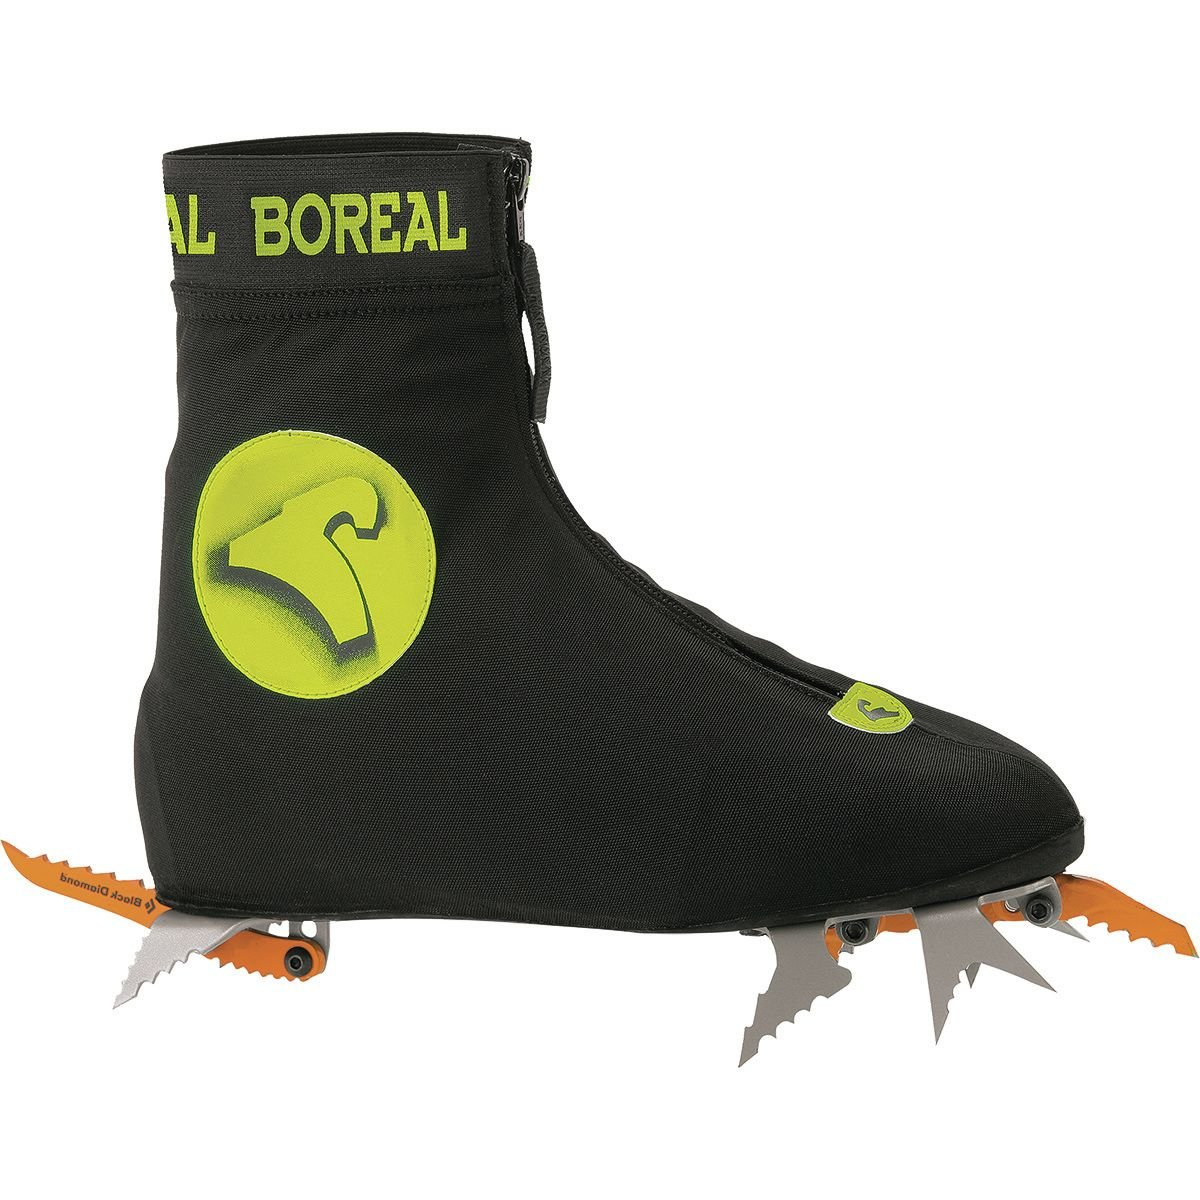 [Boreal] メンズ 47275-105 US 10.5/UK 9.5 ブラック B0768KV1YF